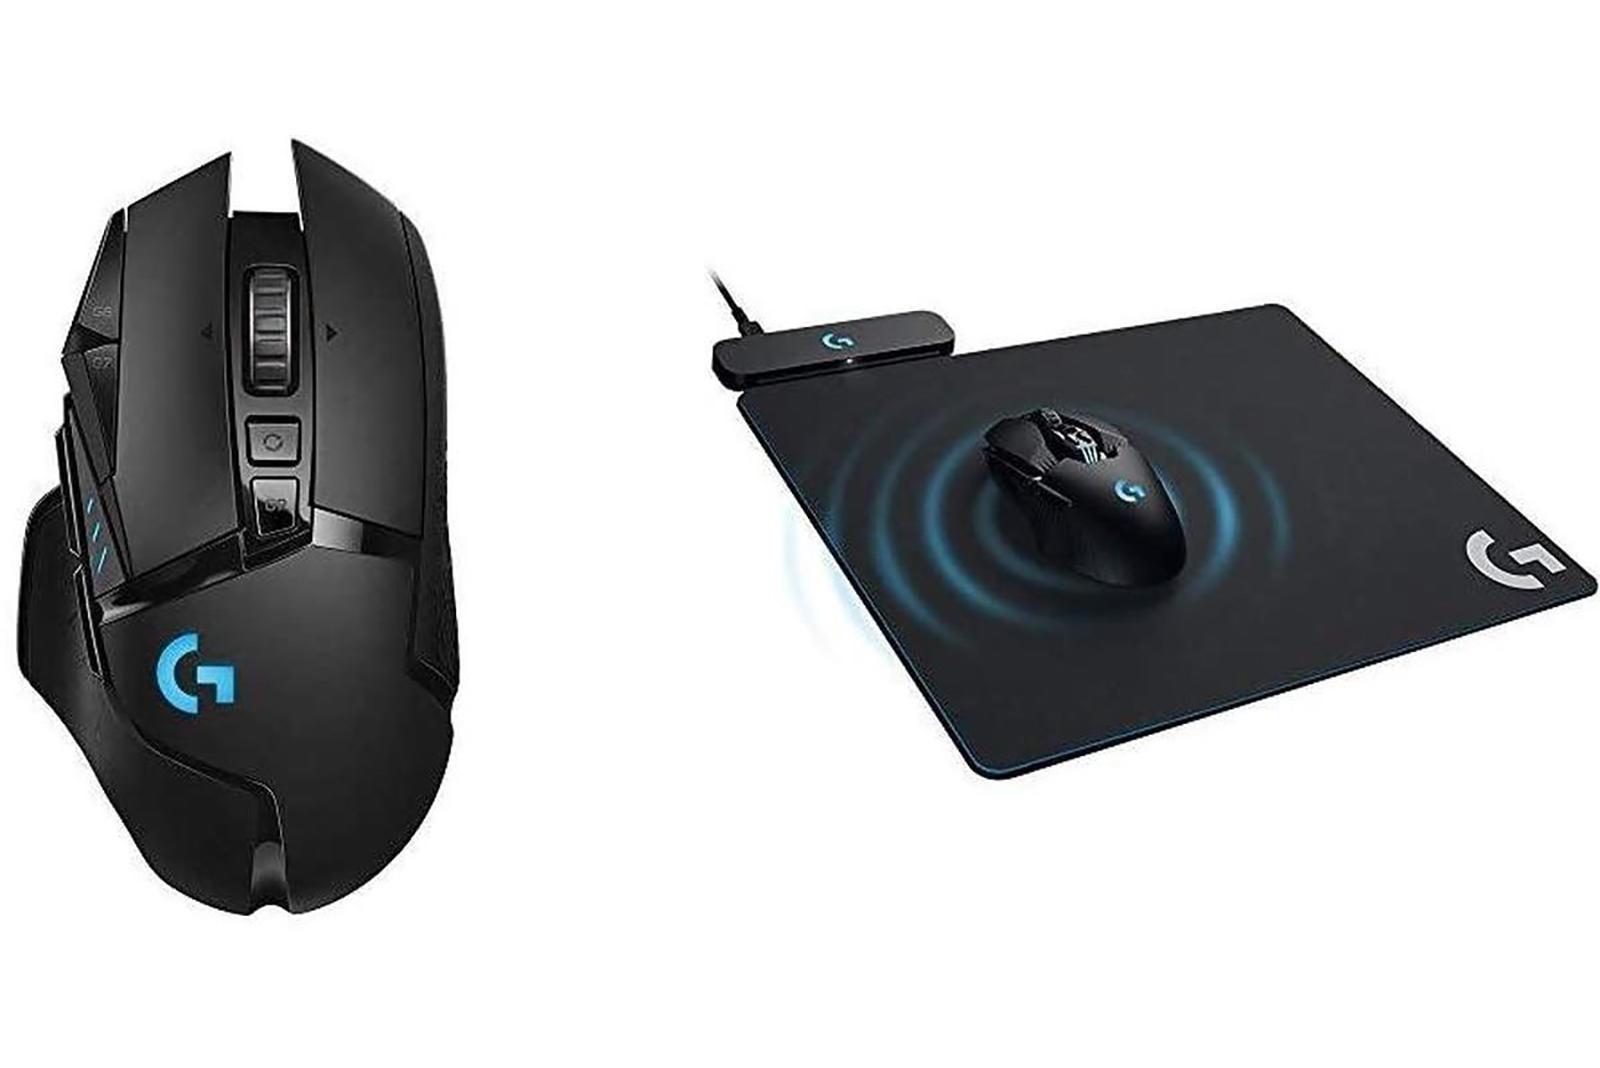 g502-and-powerplay-pad.jpg